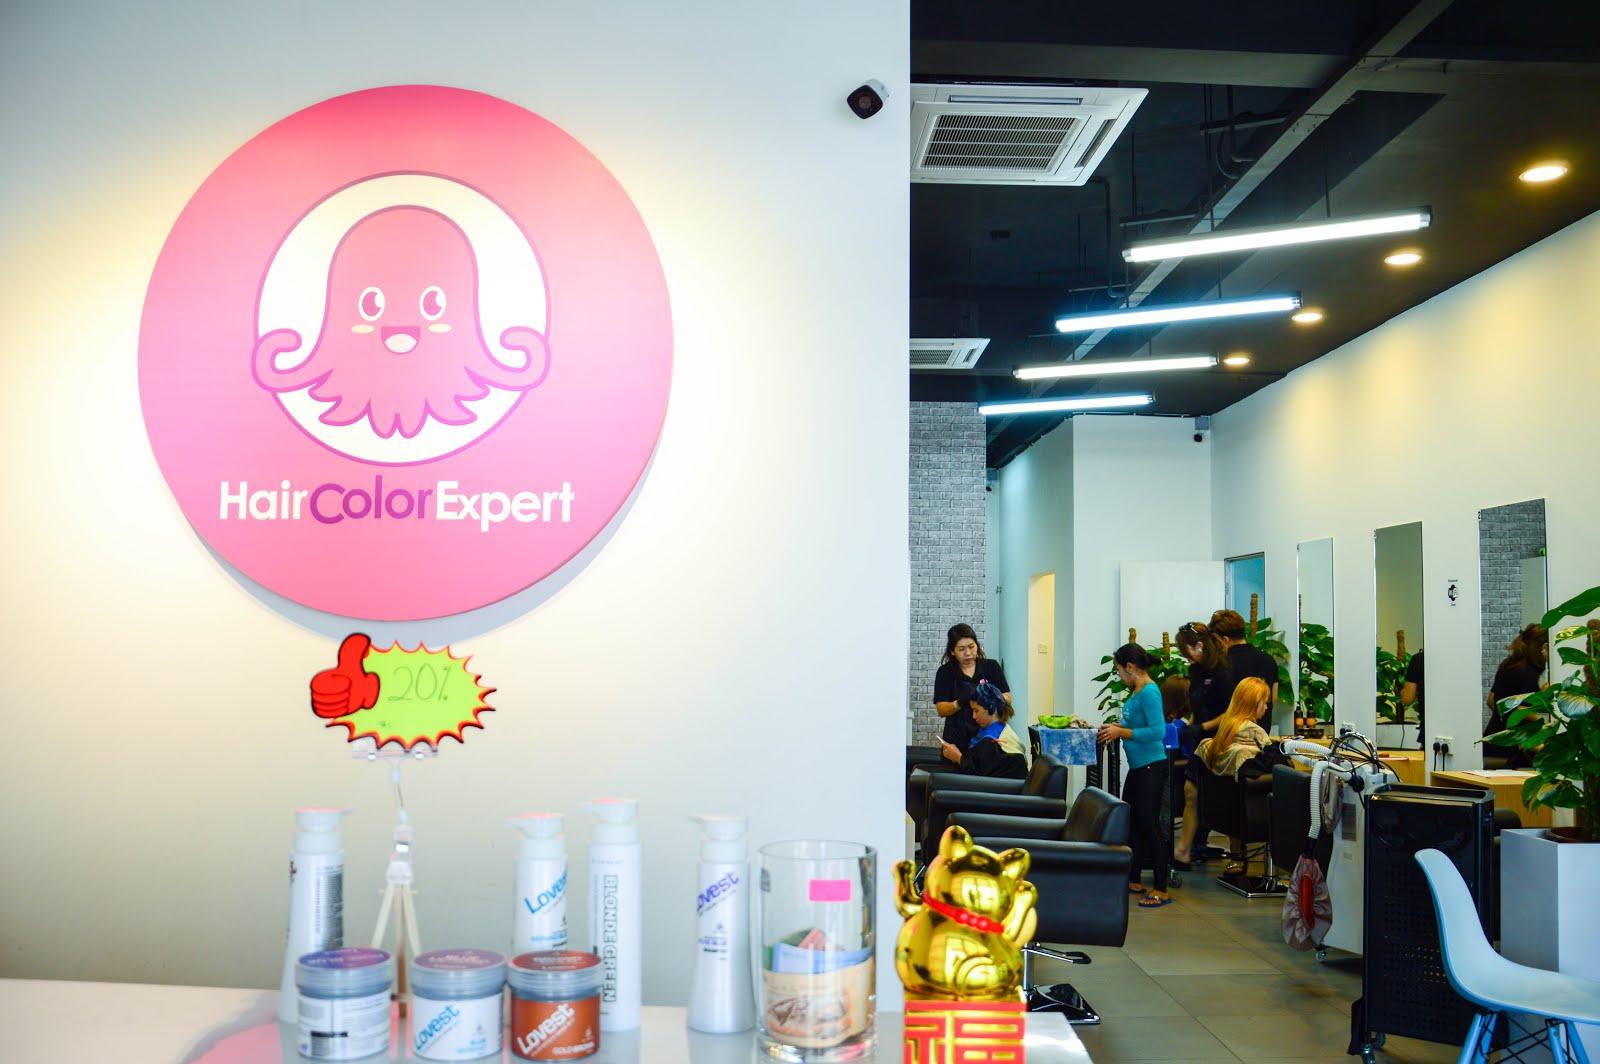 Hair Color Expert Sri P review